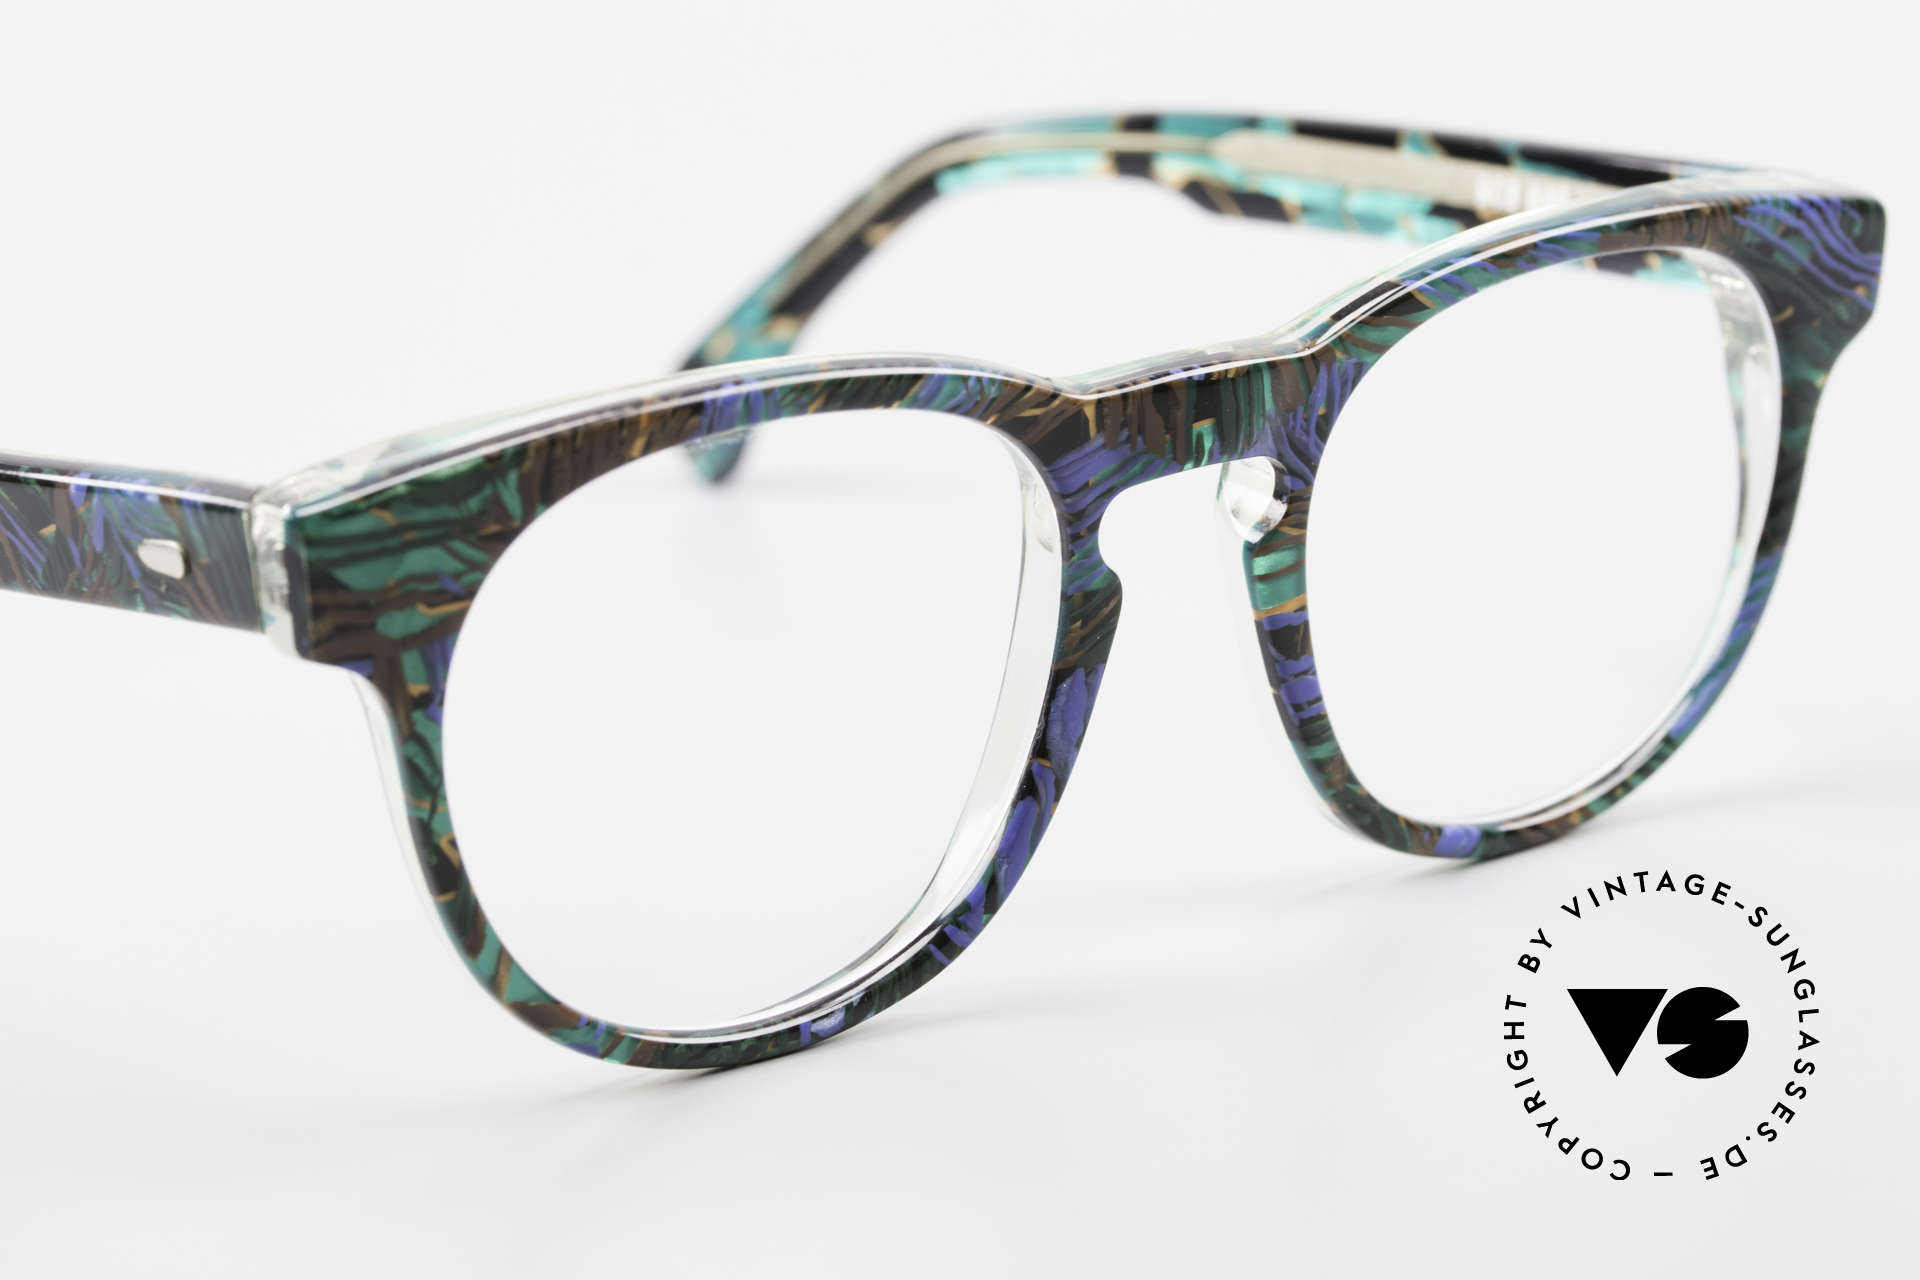 Alain Mikli 903 / 688 Panto Frame 80's Patterned, never worn (like all our vintage Alain Mikli specs), Made for Men and Women